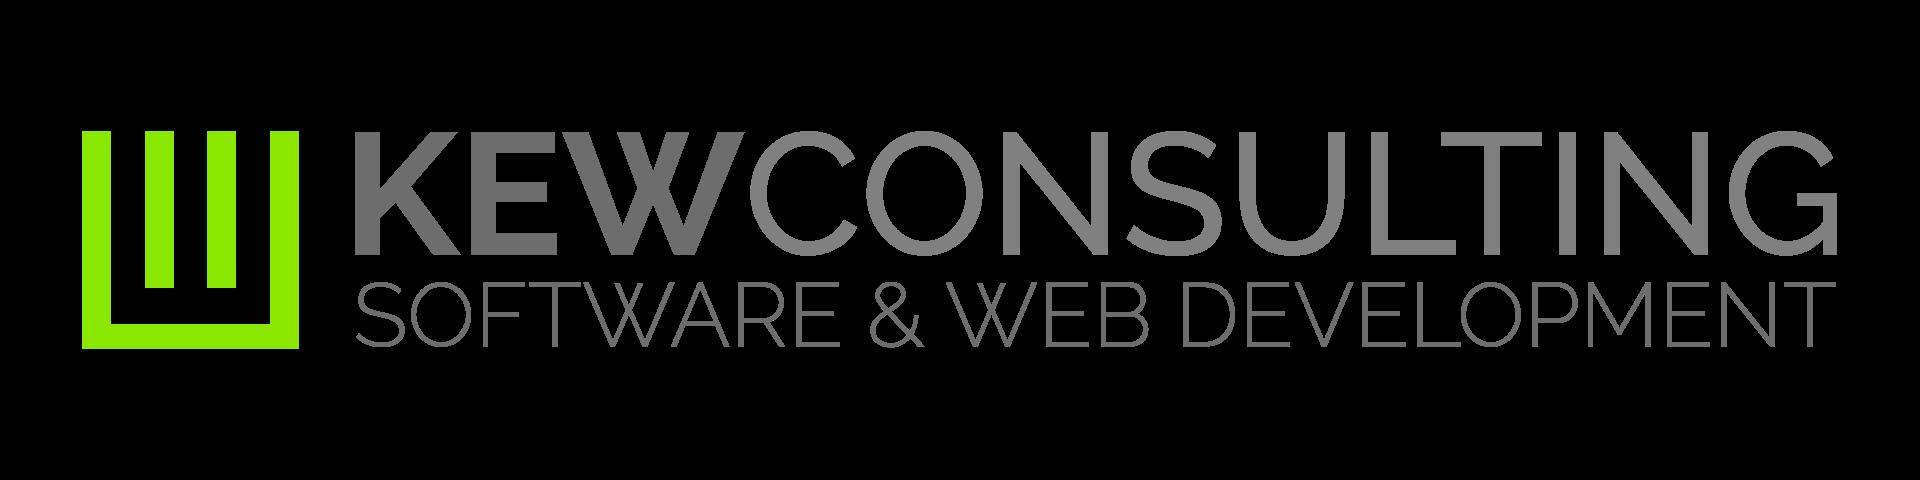 Kew Consulting-Software & Web Development